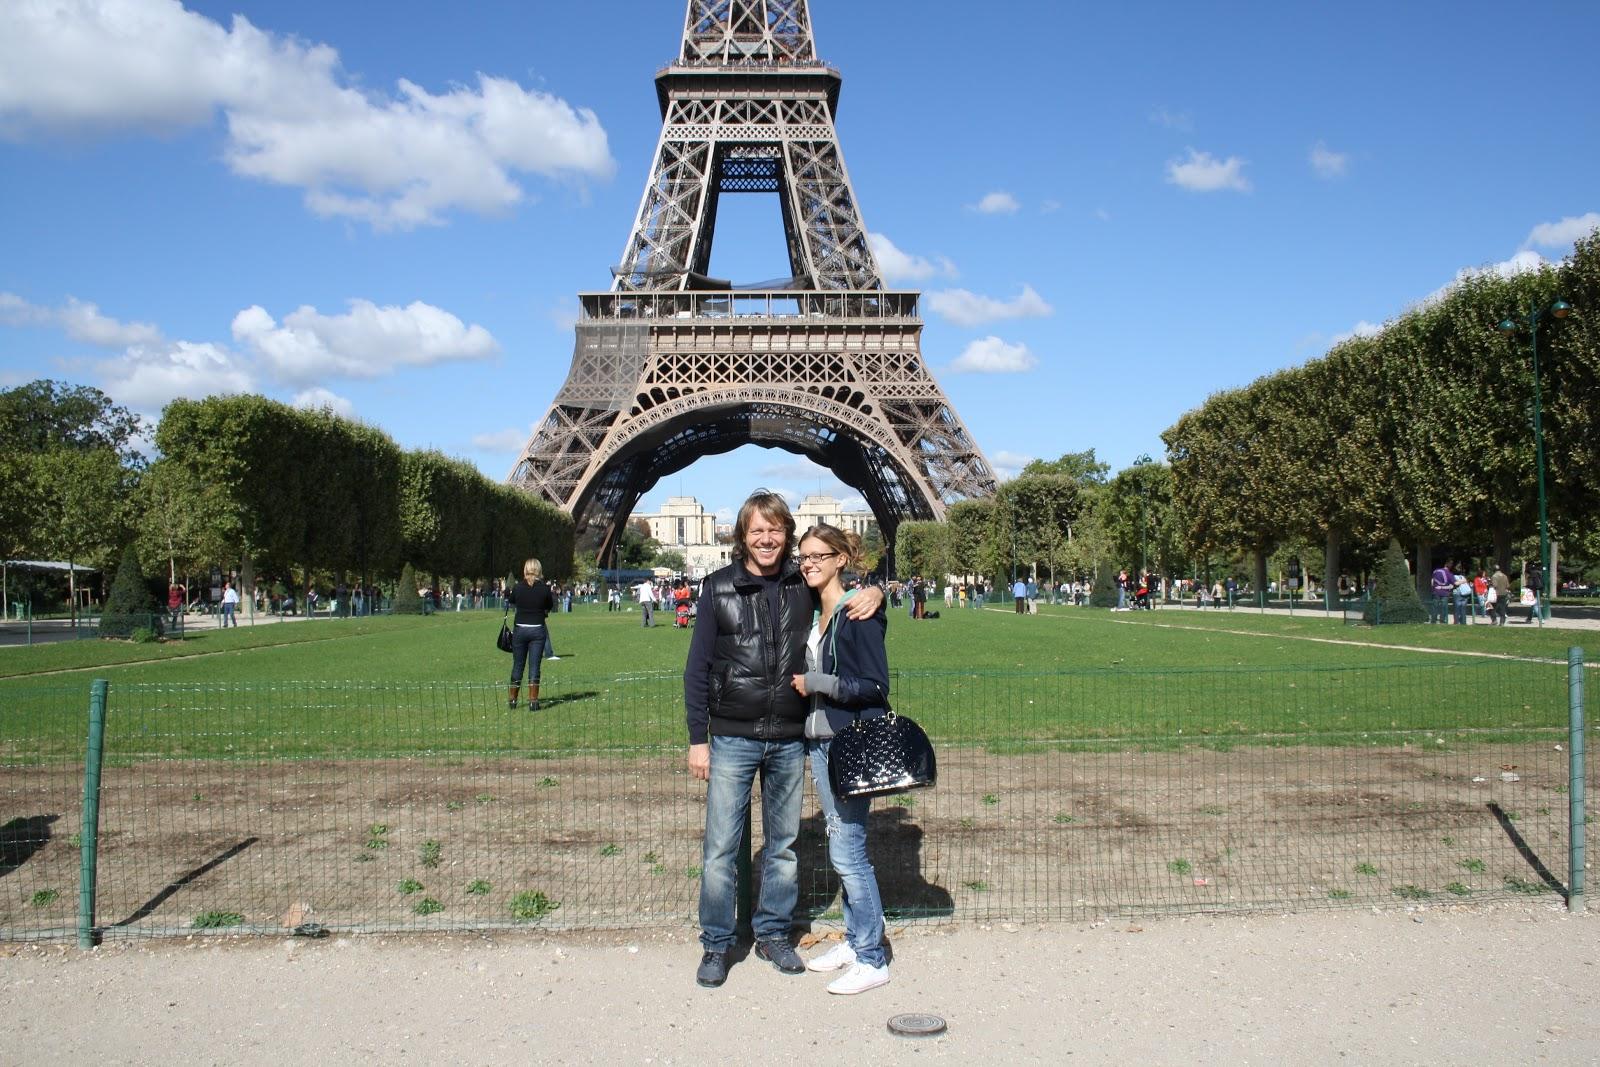 Urban fashion scenario i fell in love with paris - Restaurant dans la tour eiffel ...